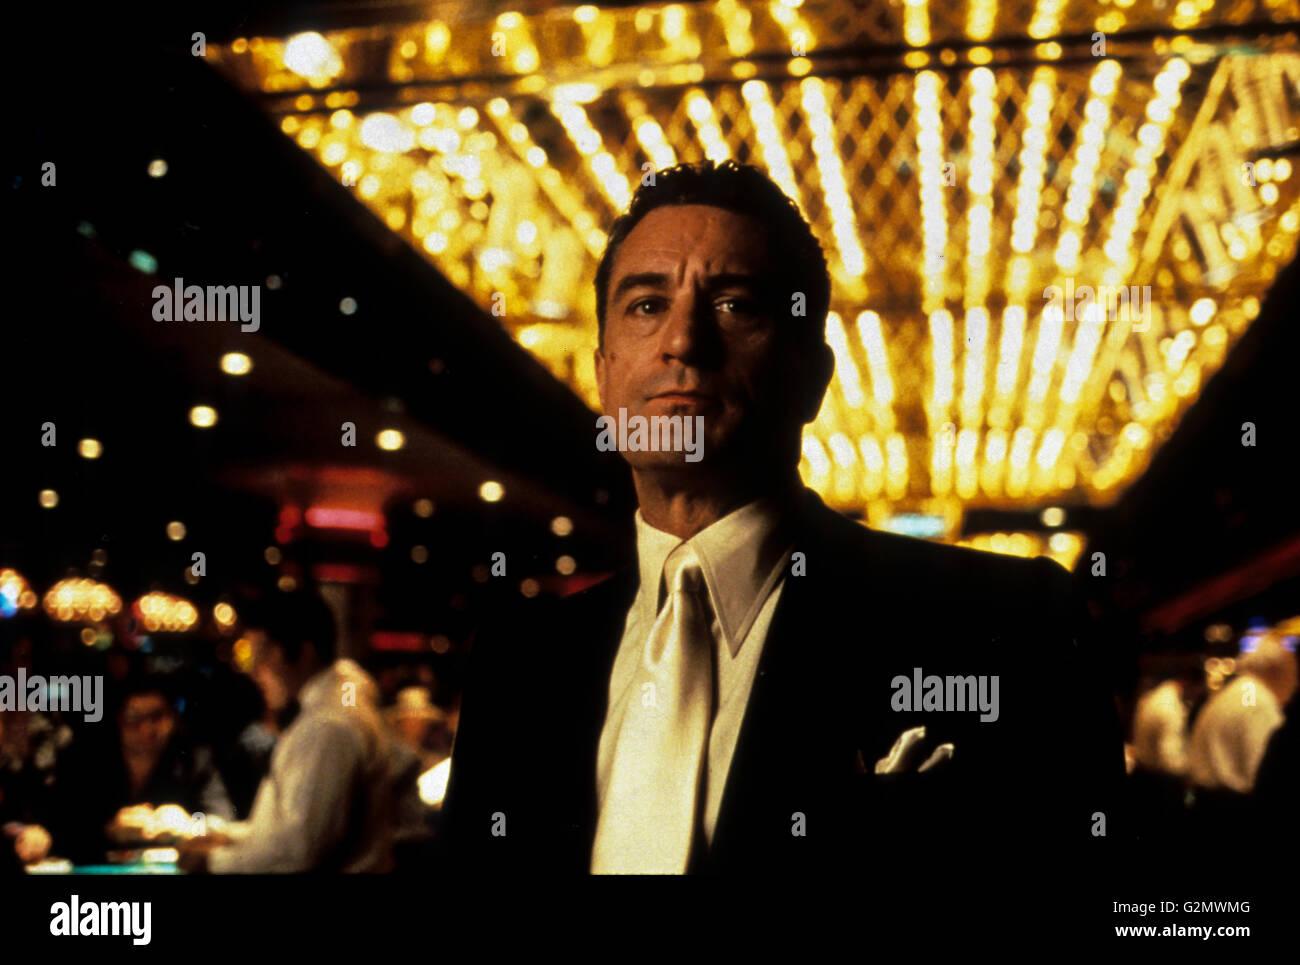 robert de niro,casino - Stock Image